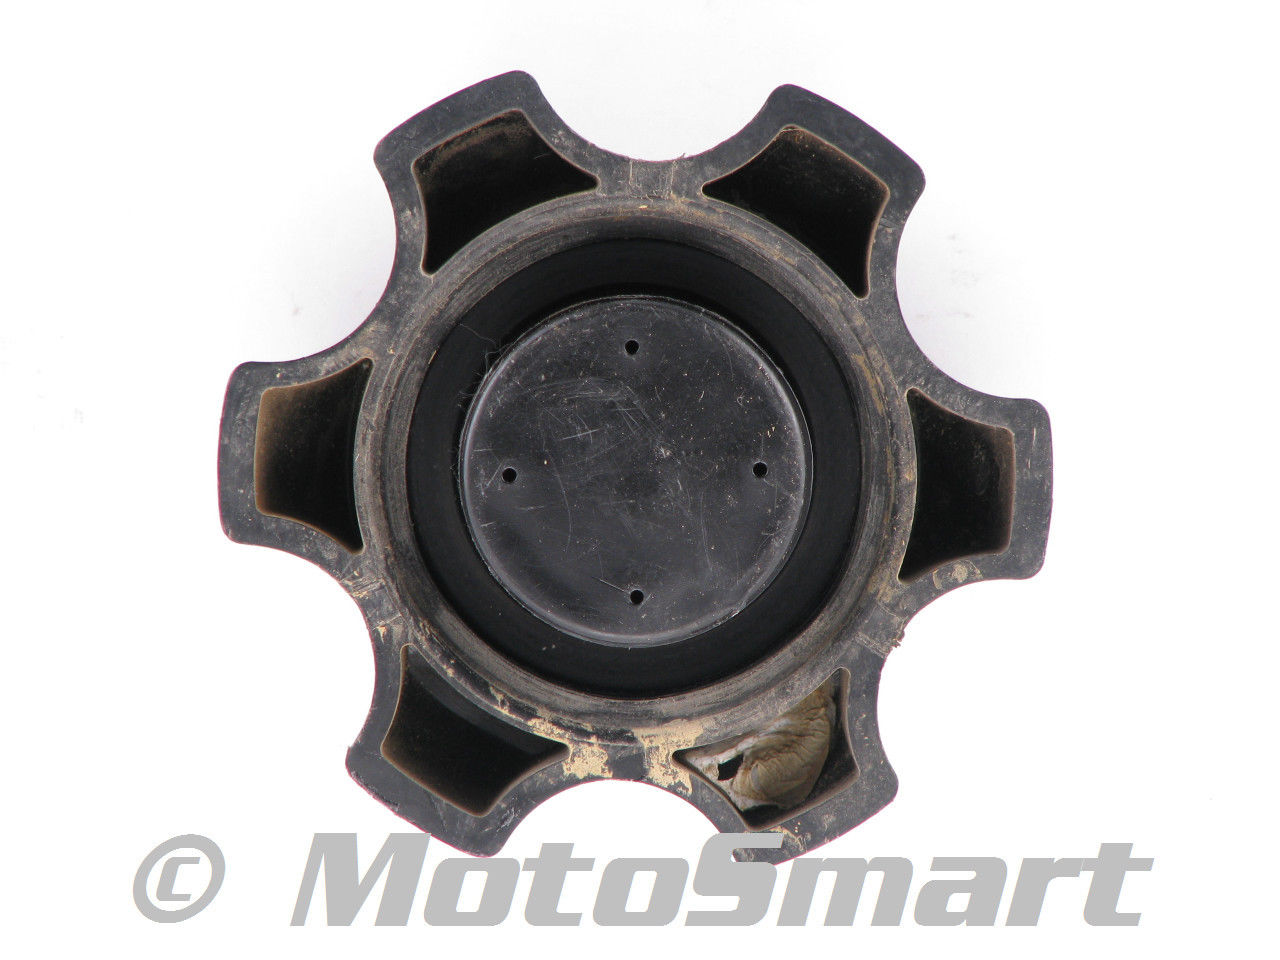 90-1990-Honda-CR500R-CR500-CR-500-R-Gas-Fuel-Tank-Cap-Good-Used-101002-280549050892-3